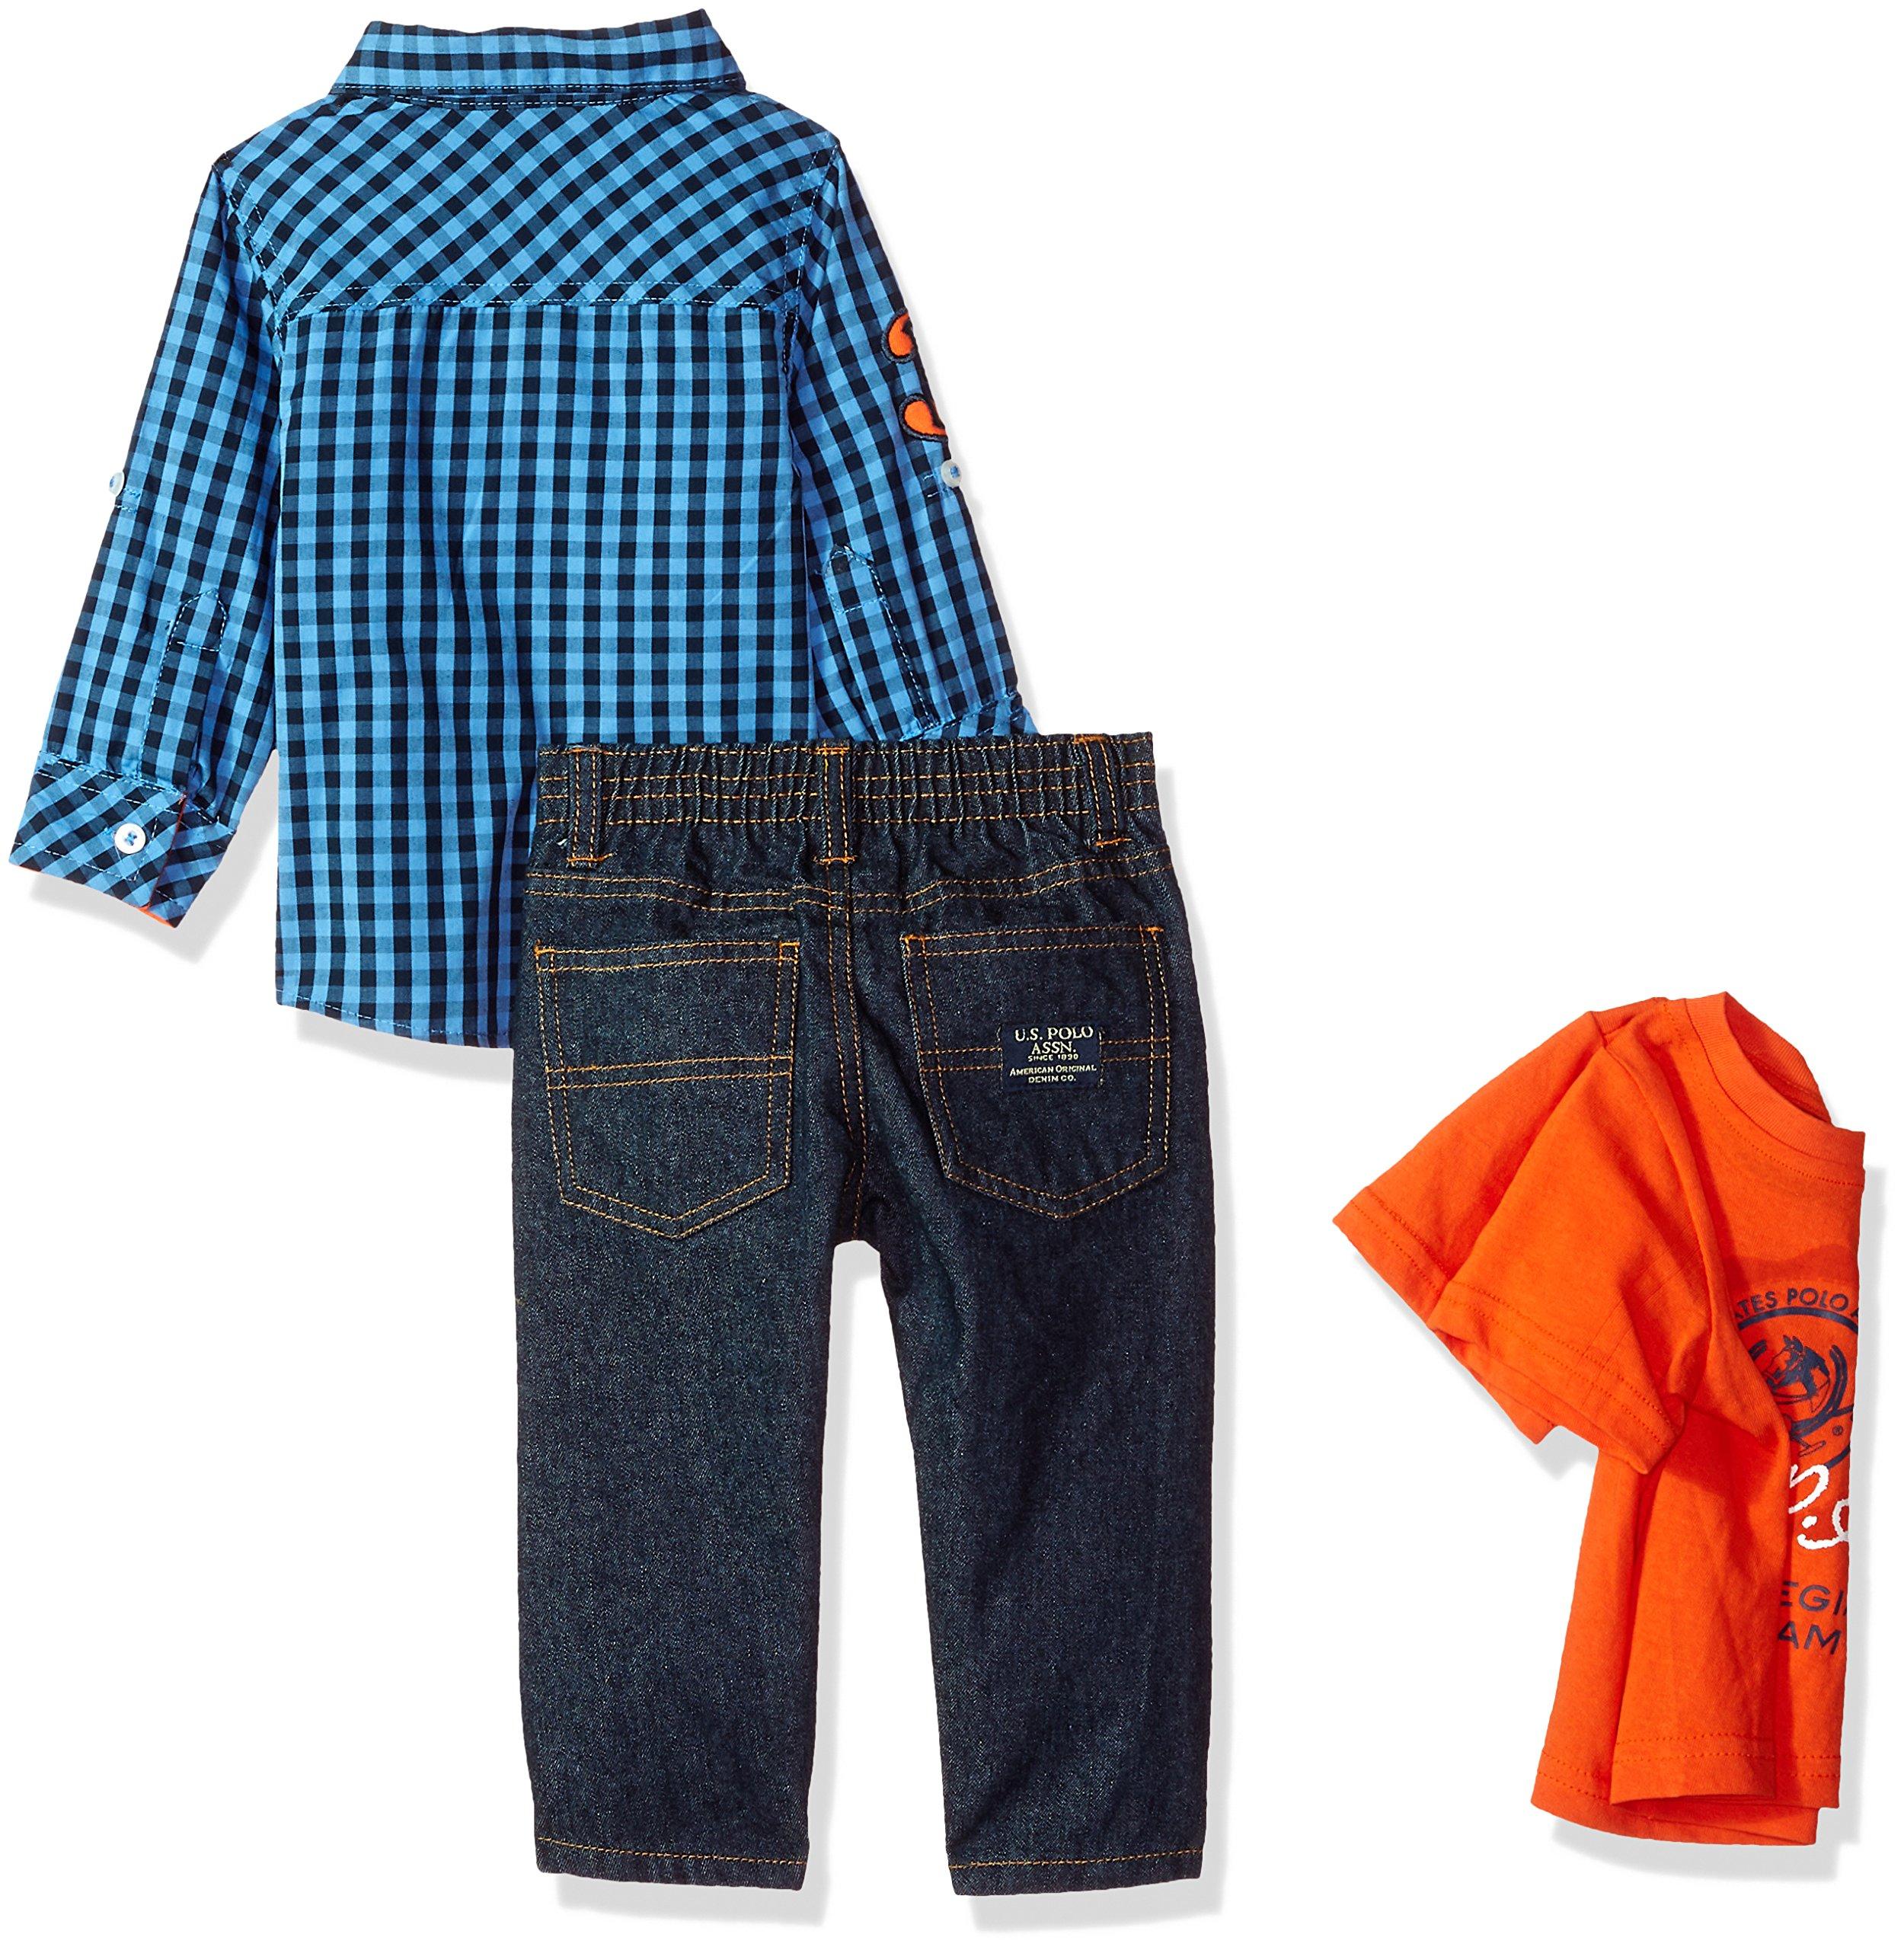 US Polo Assn 3pcs Outfit Set Plaid Long Sleeves Shirt /& Denim Pants Boys Outfit